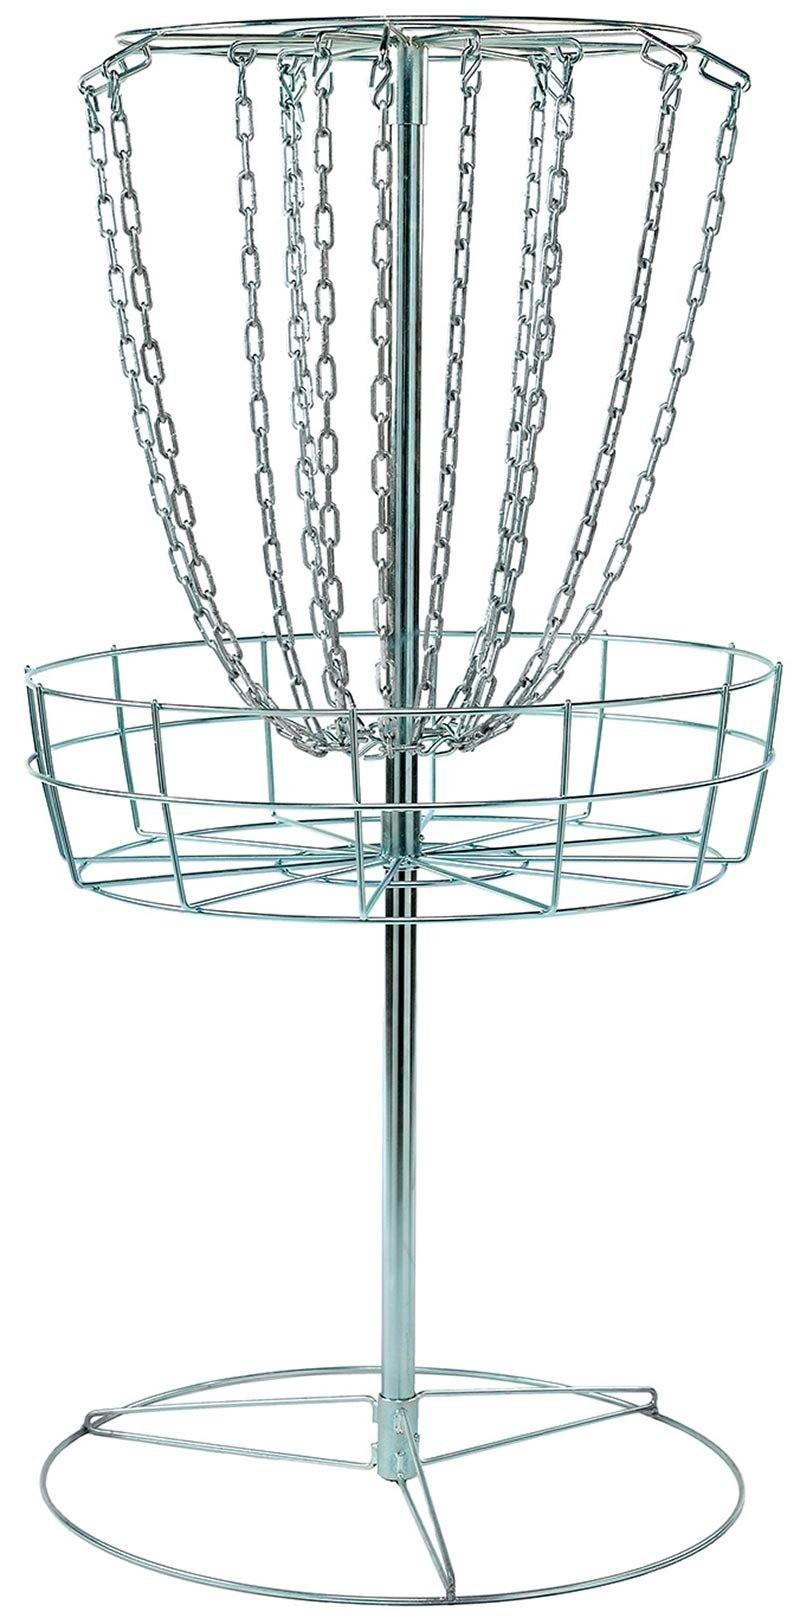 DGA M-14 Portable Disc Golf Basket